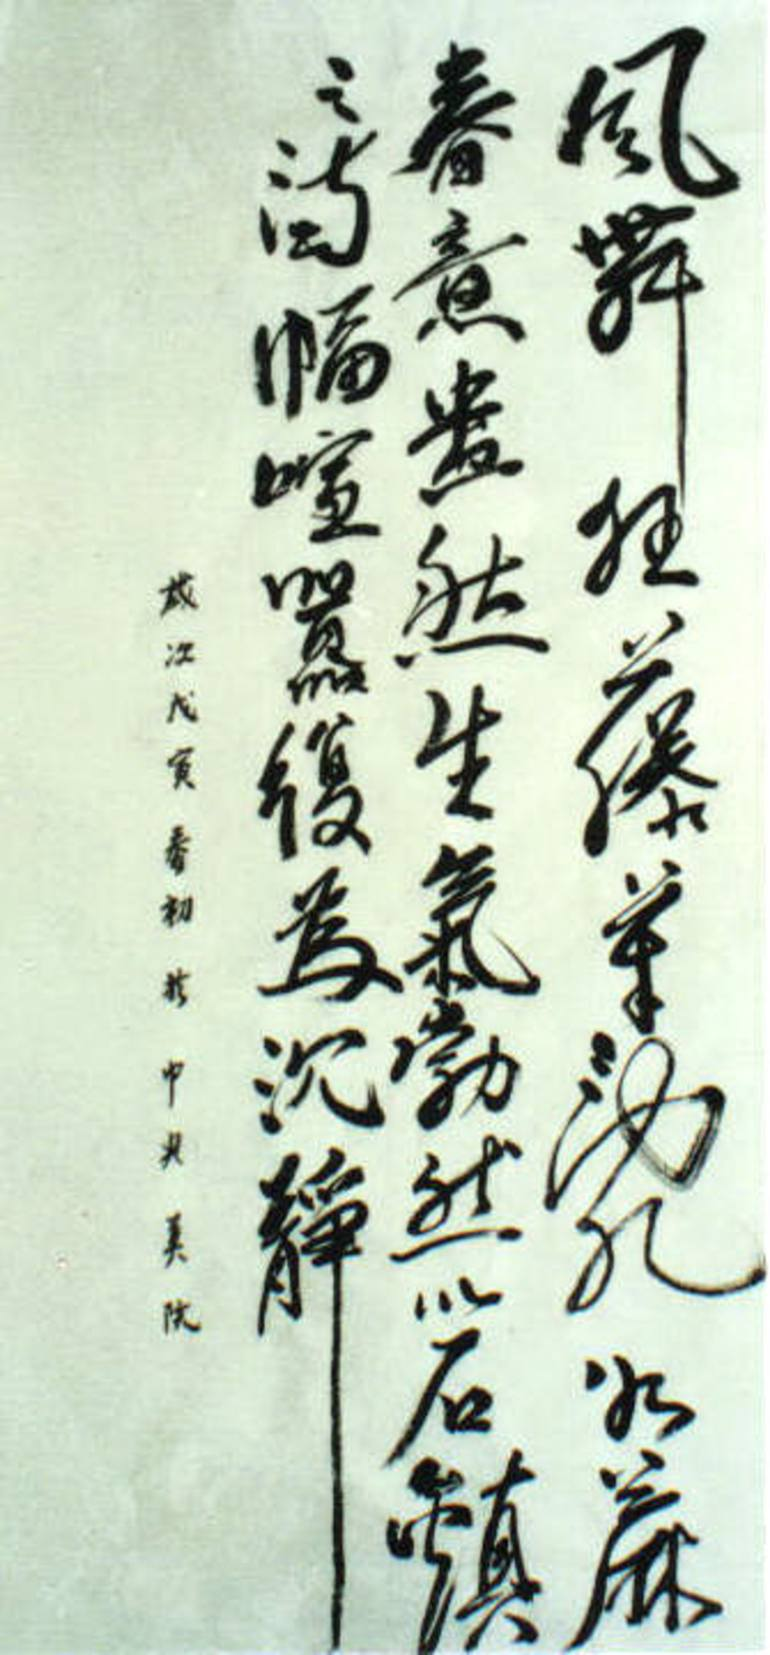 770x1655 Saatchi Art Traditional Chinese Calligraphy Drawing By Jayamini